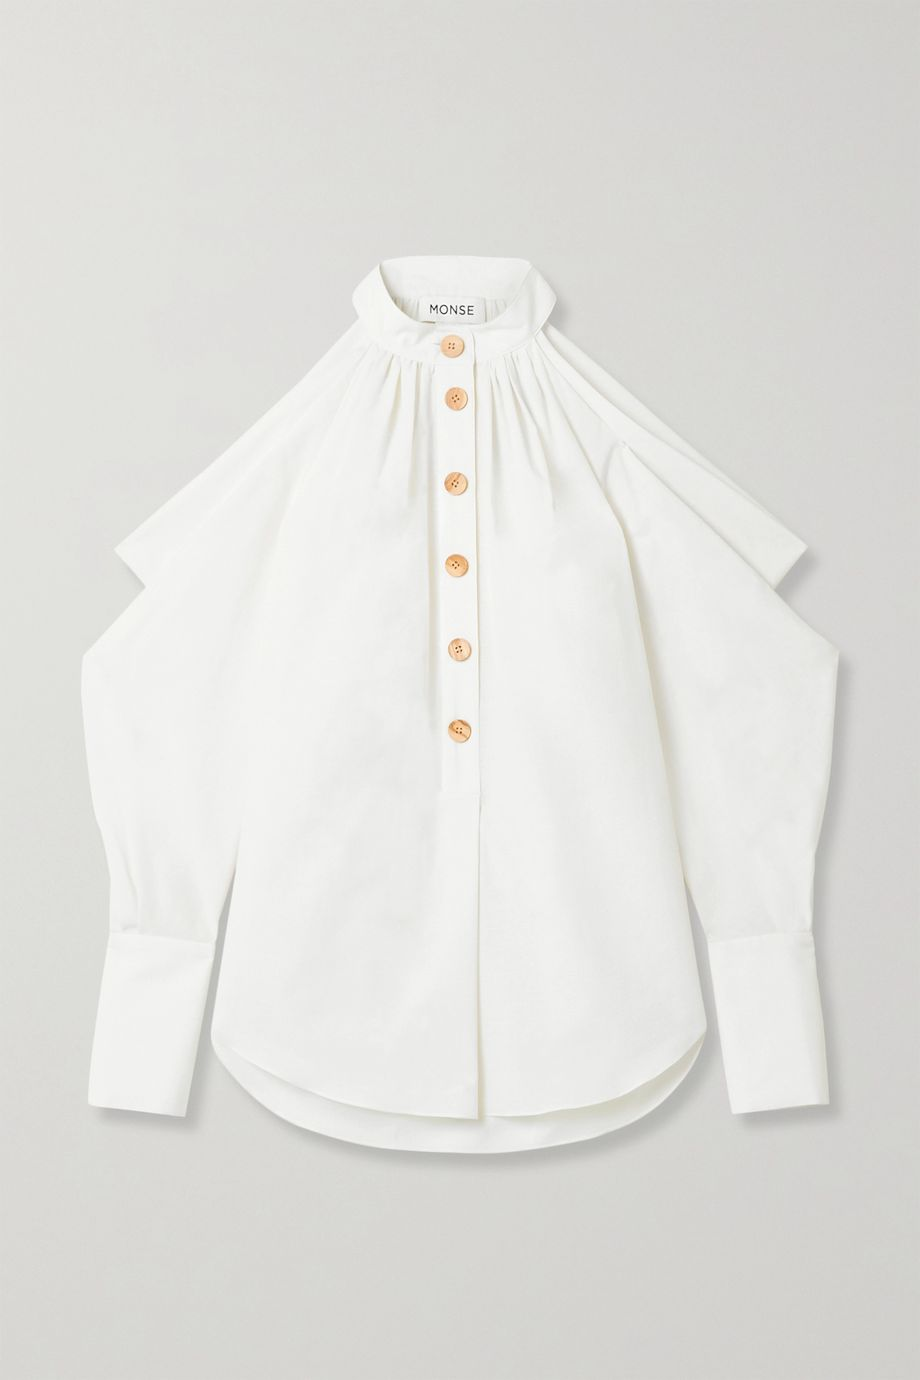 Monse Cold-shoulder cotton and linen-blend top